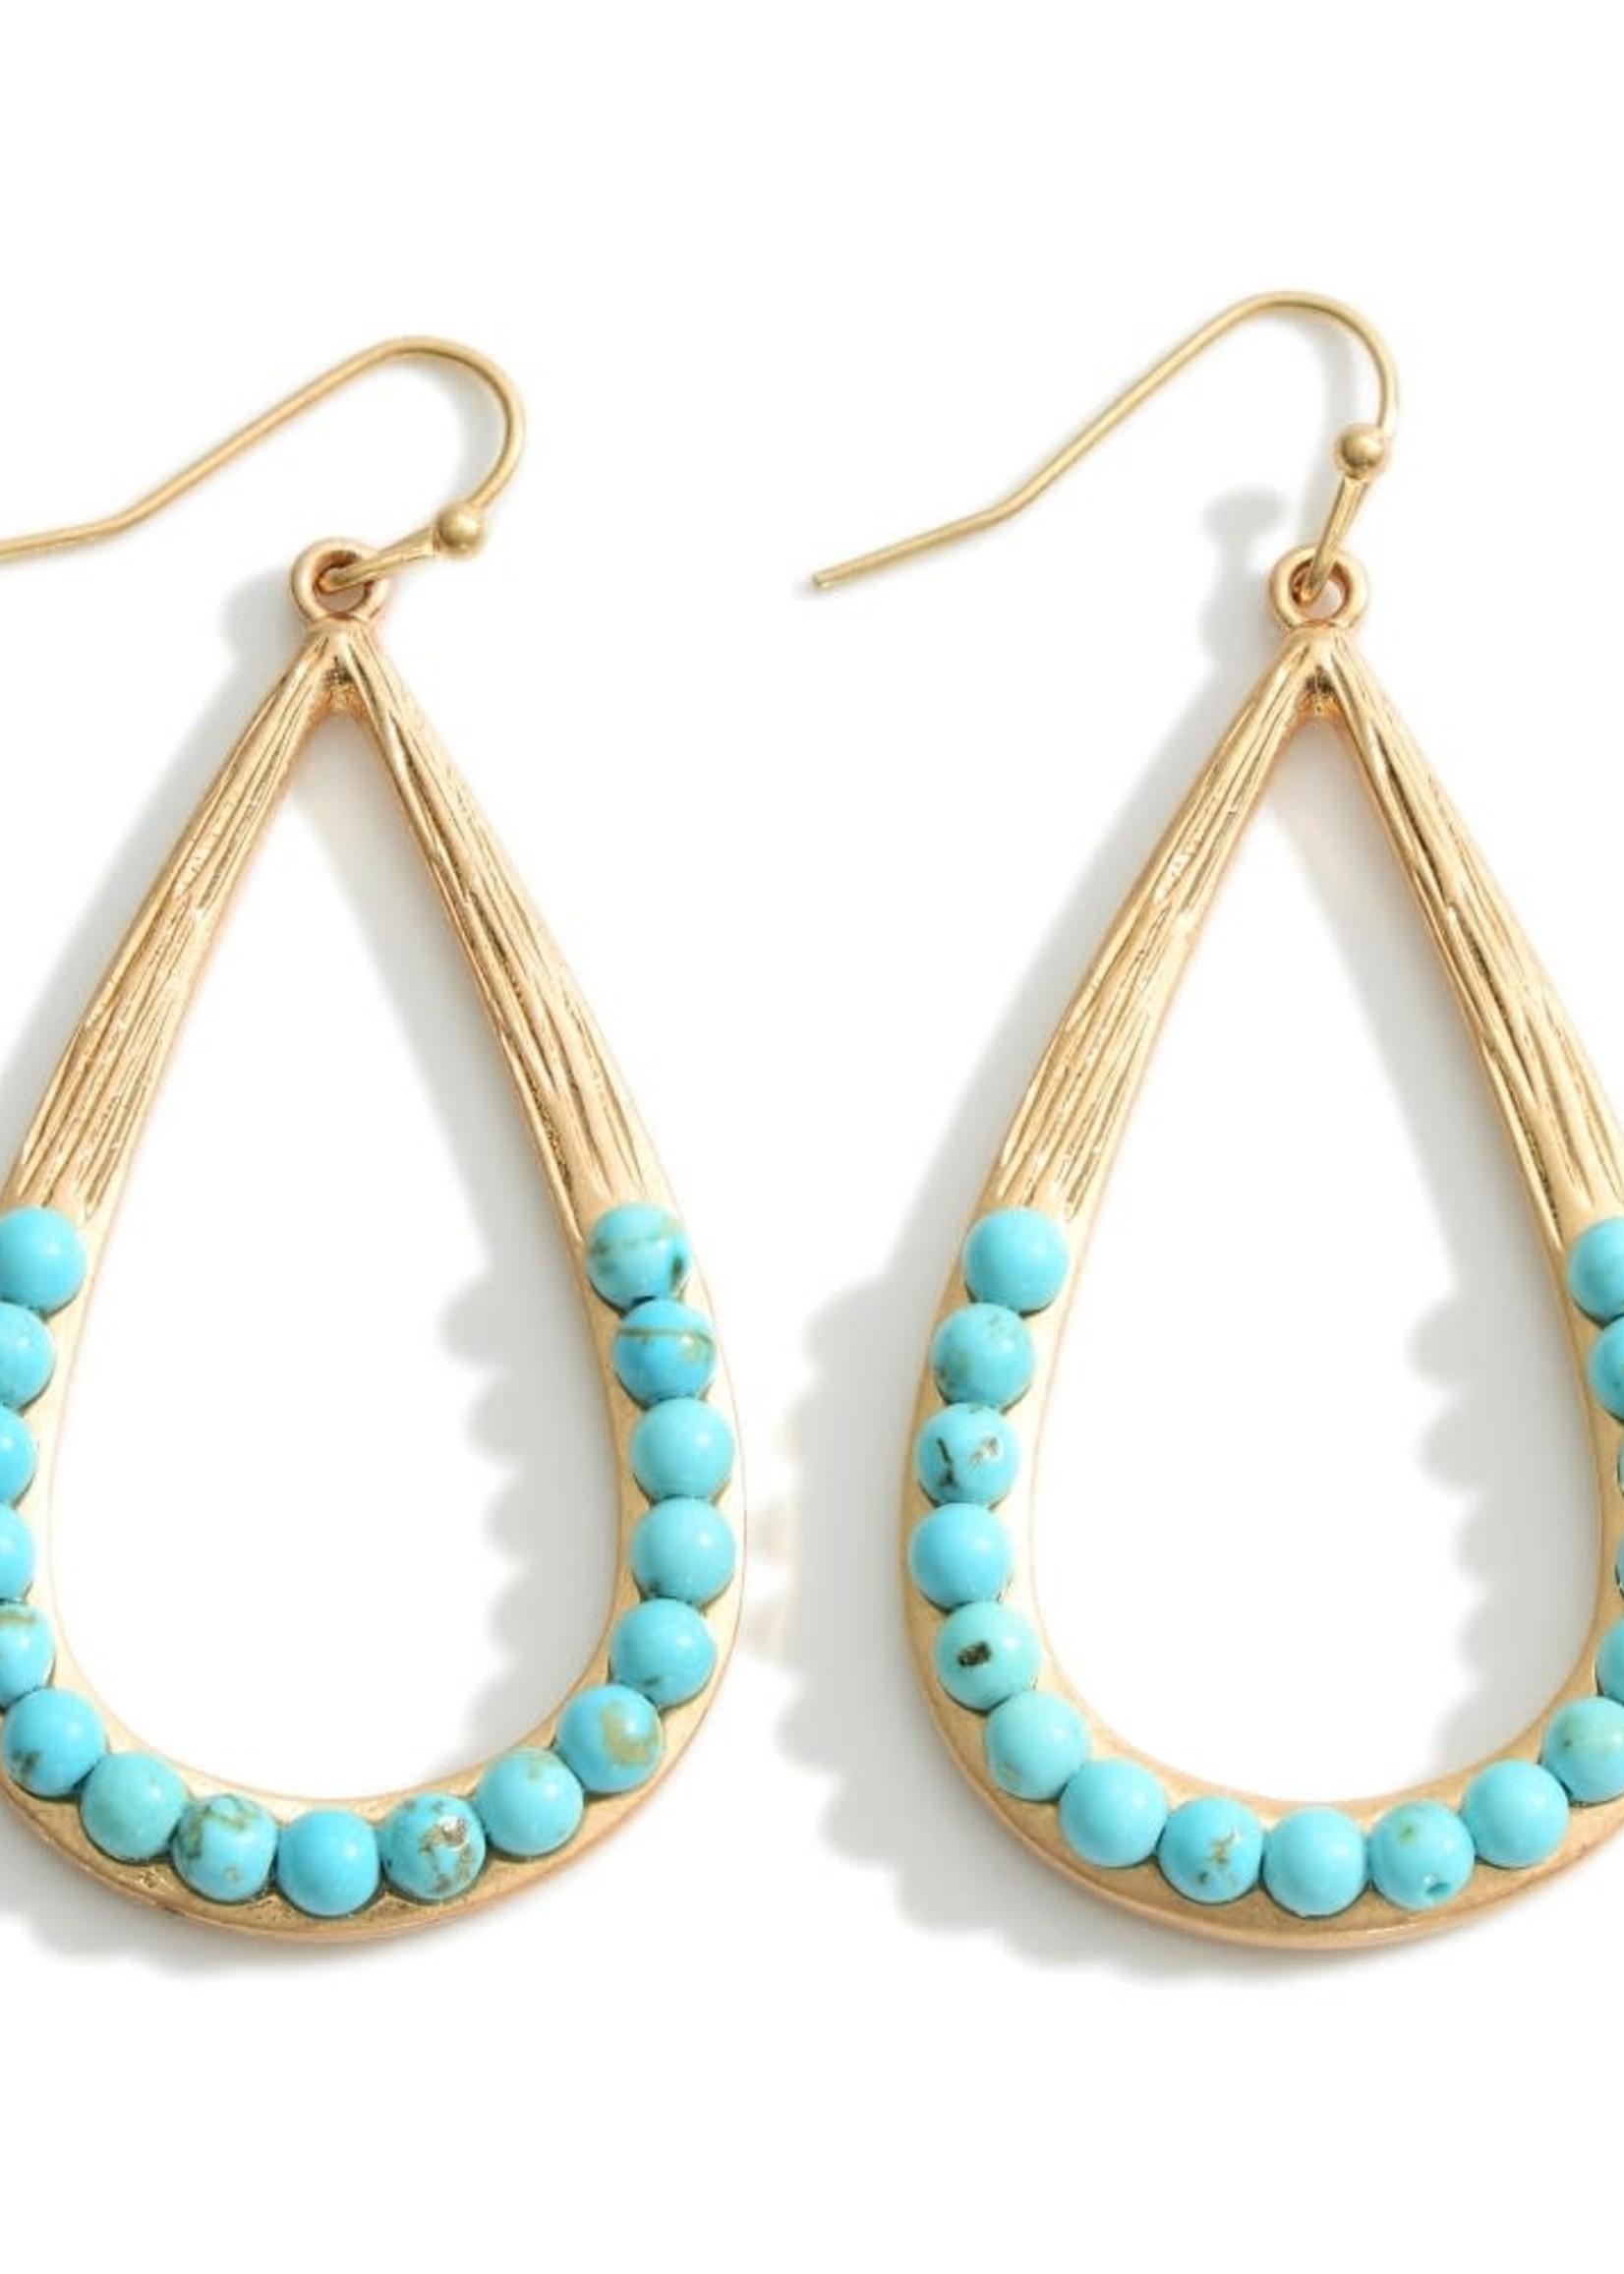 Turquoise Metal Teardrop Earrings